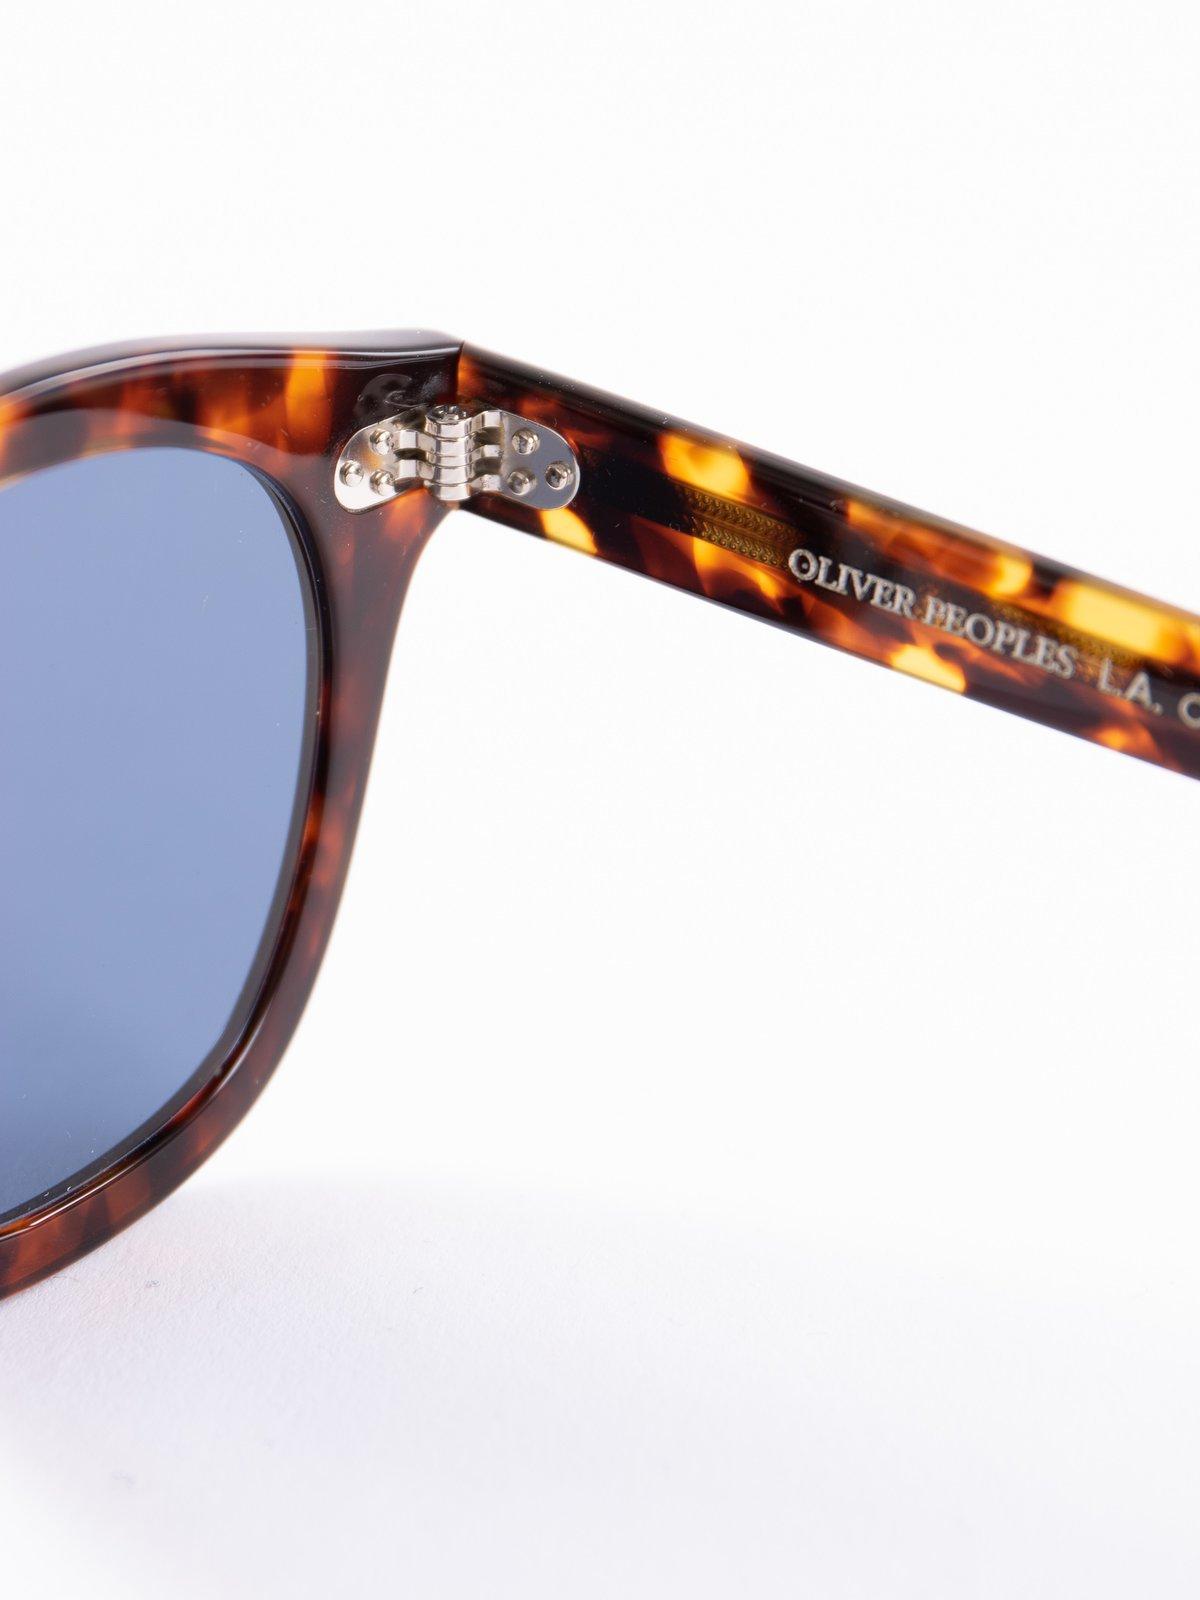 DM2/Dark Blue Boudreau LA Sunglasses - Image 4